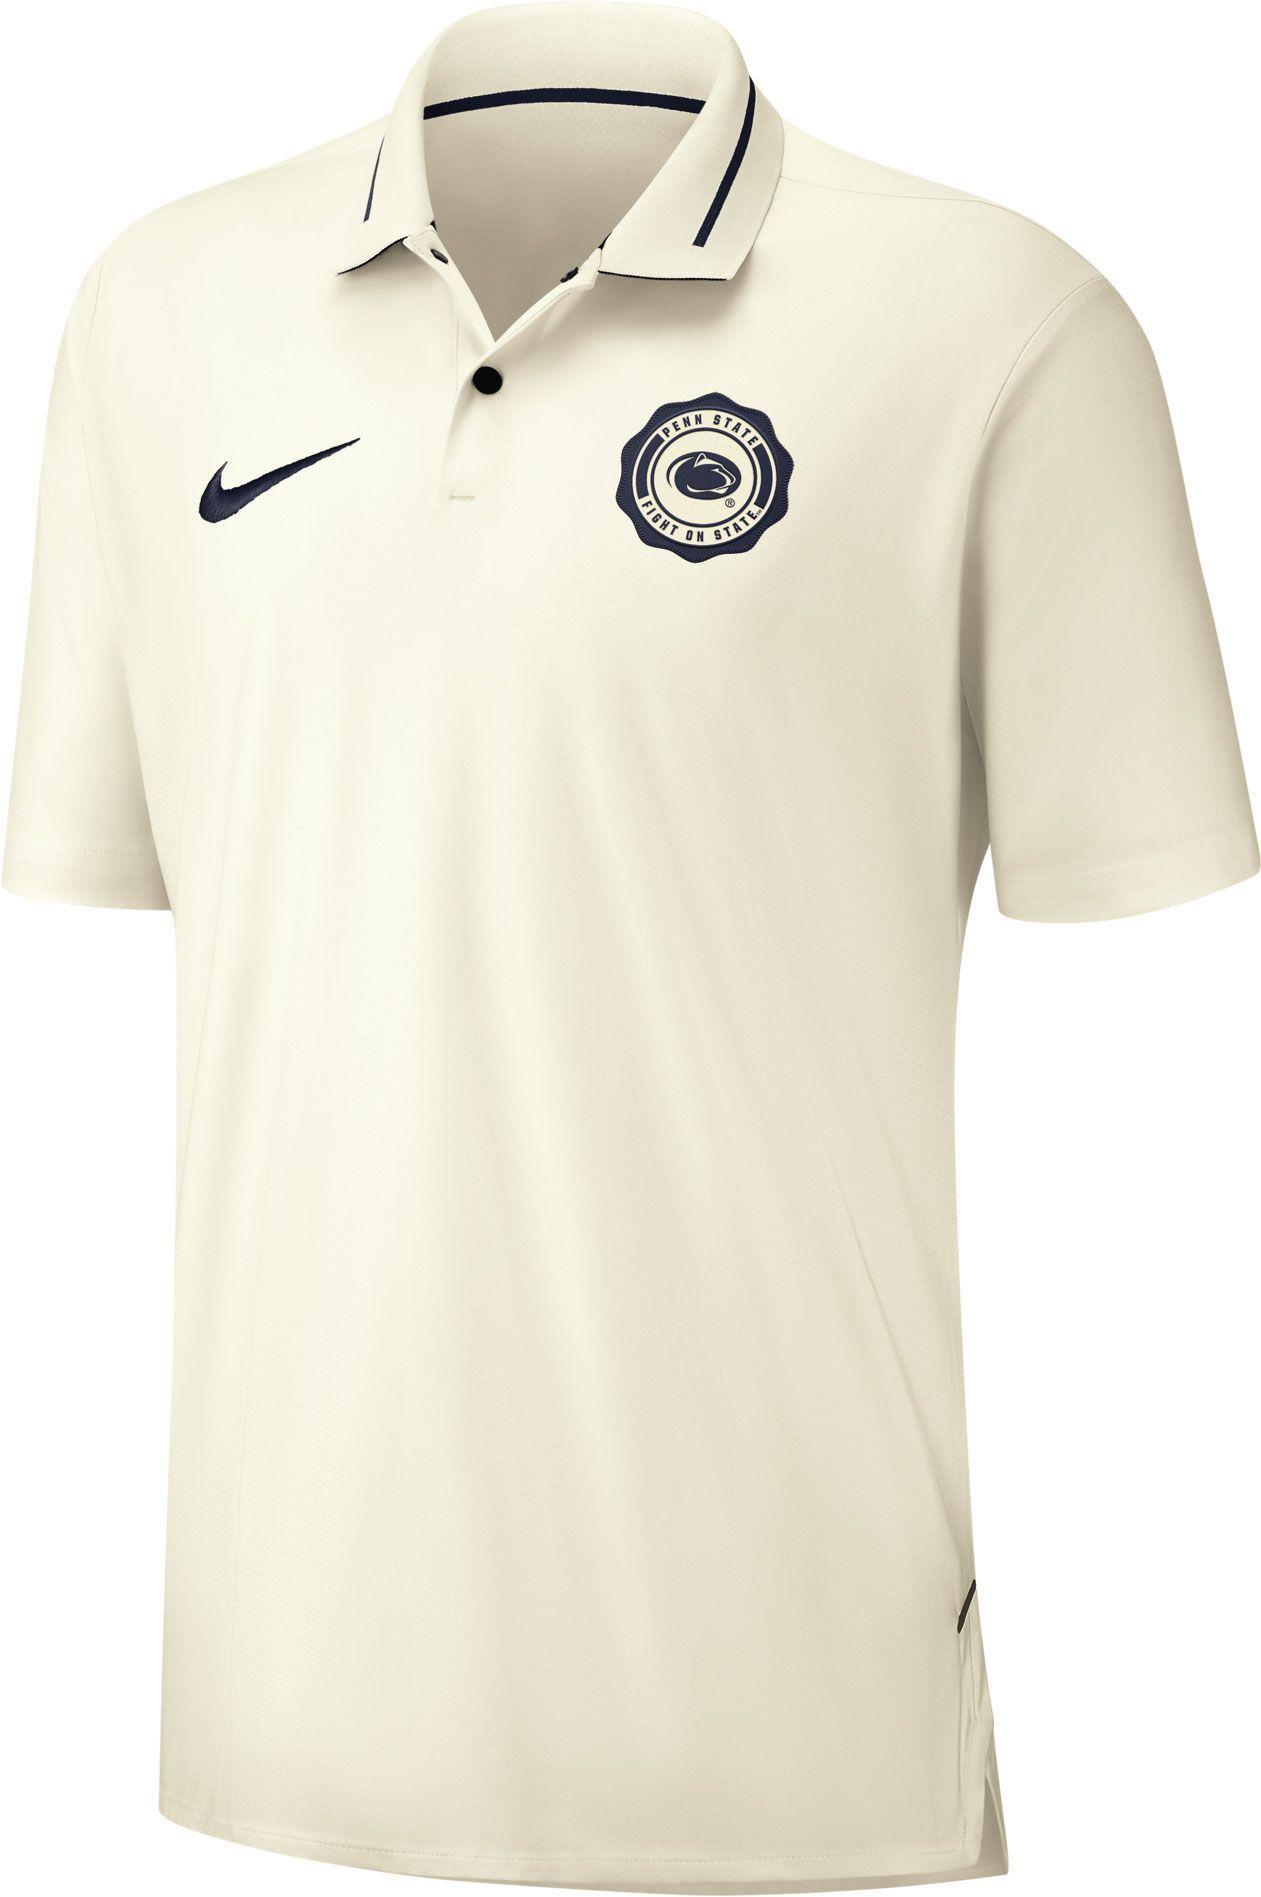 Nike Mens Penn State Nittany Lions Rival Football White Polo